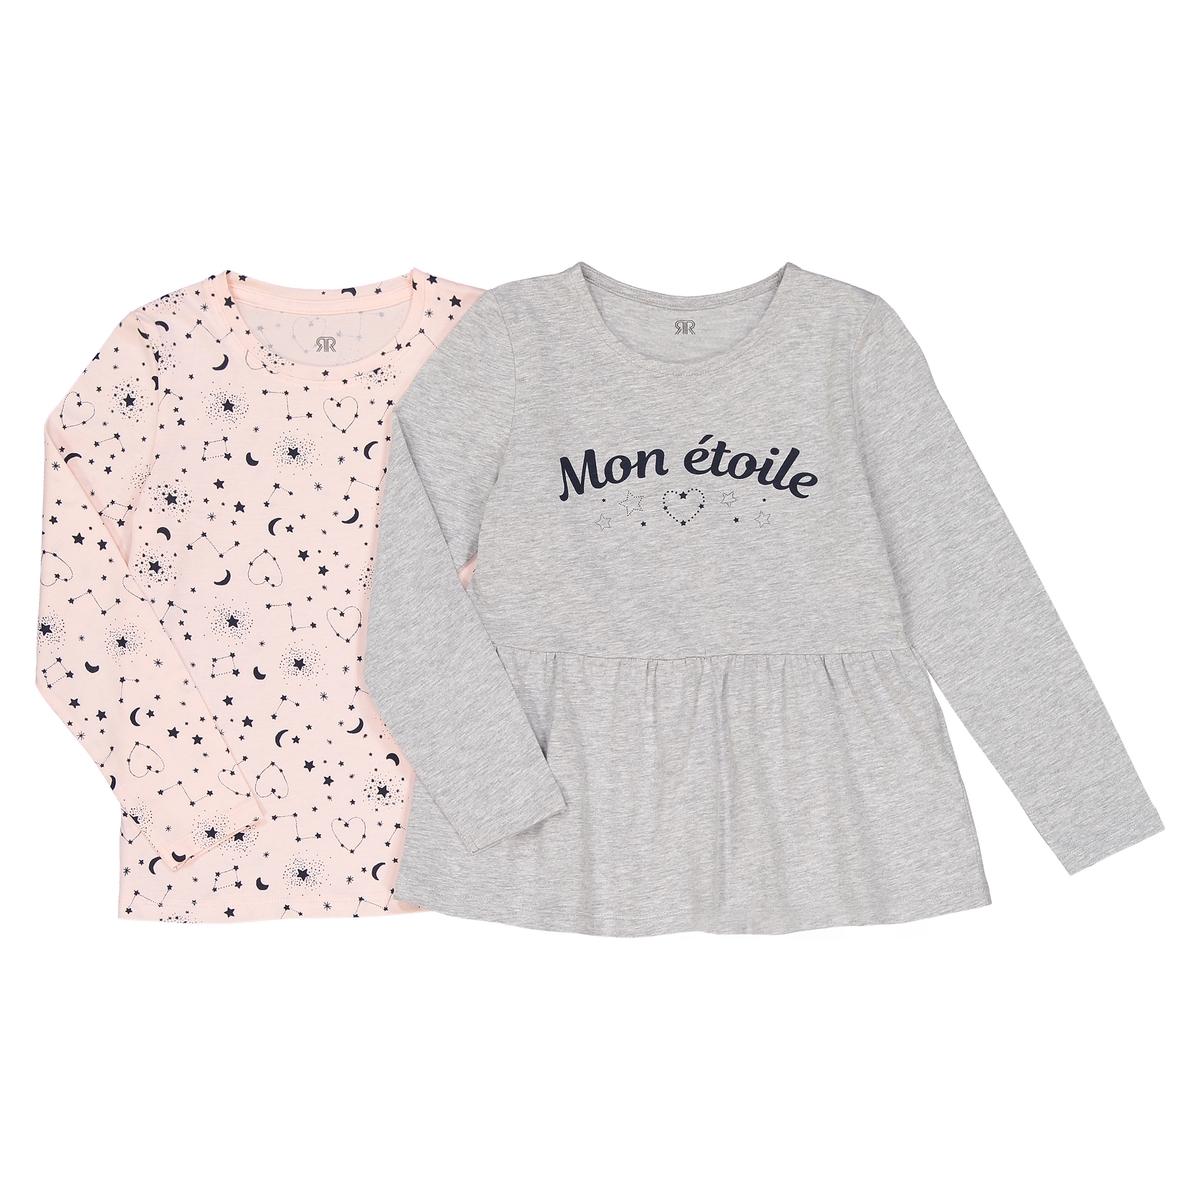 Confezione da t-shirt maniche lunghe 3 - 12 anni